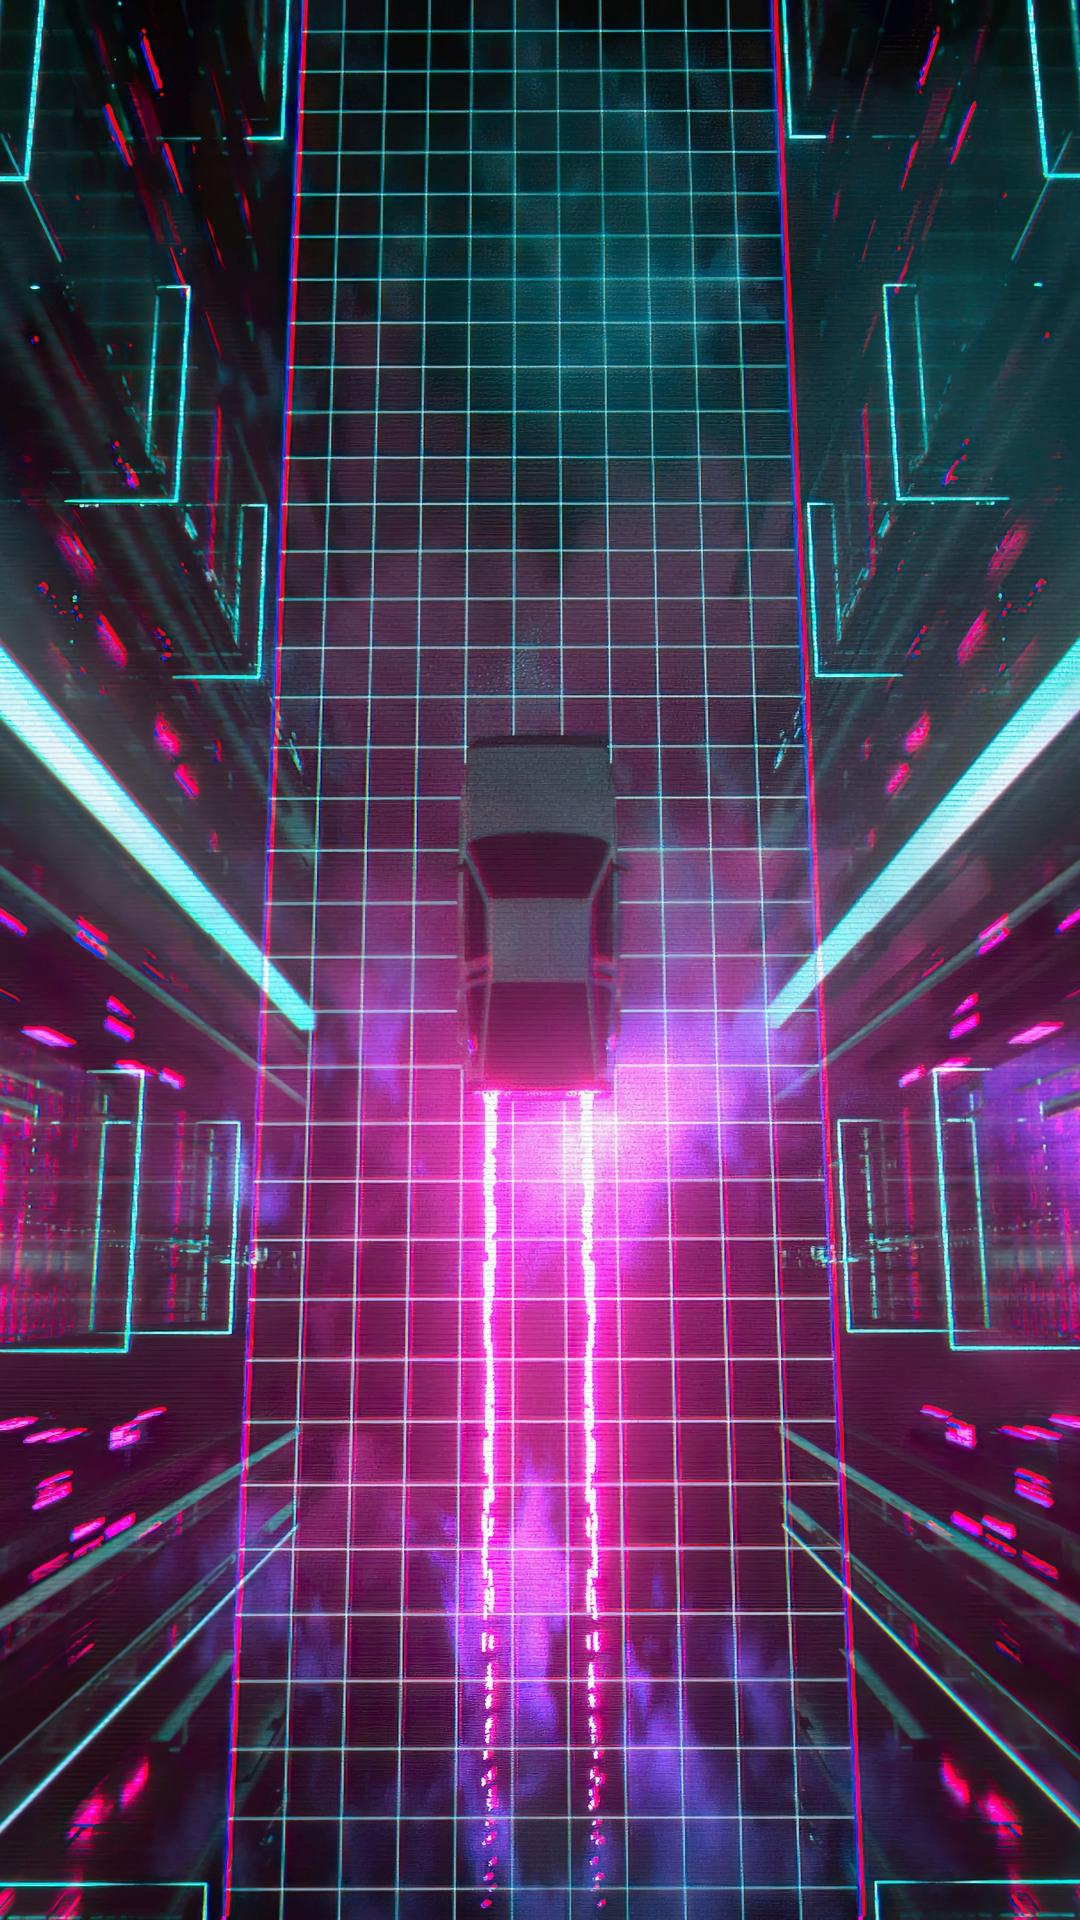 4 cool car cyberpunk wallpapers | WallpaperiZe - Phone Wallpapers